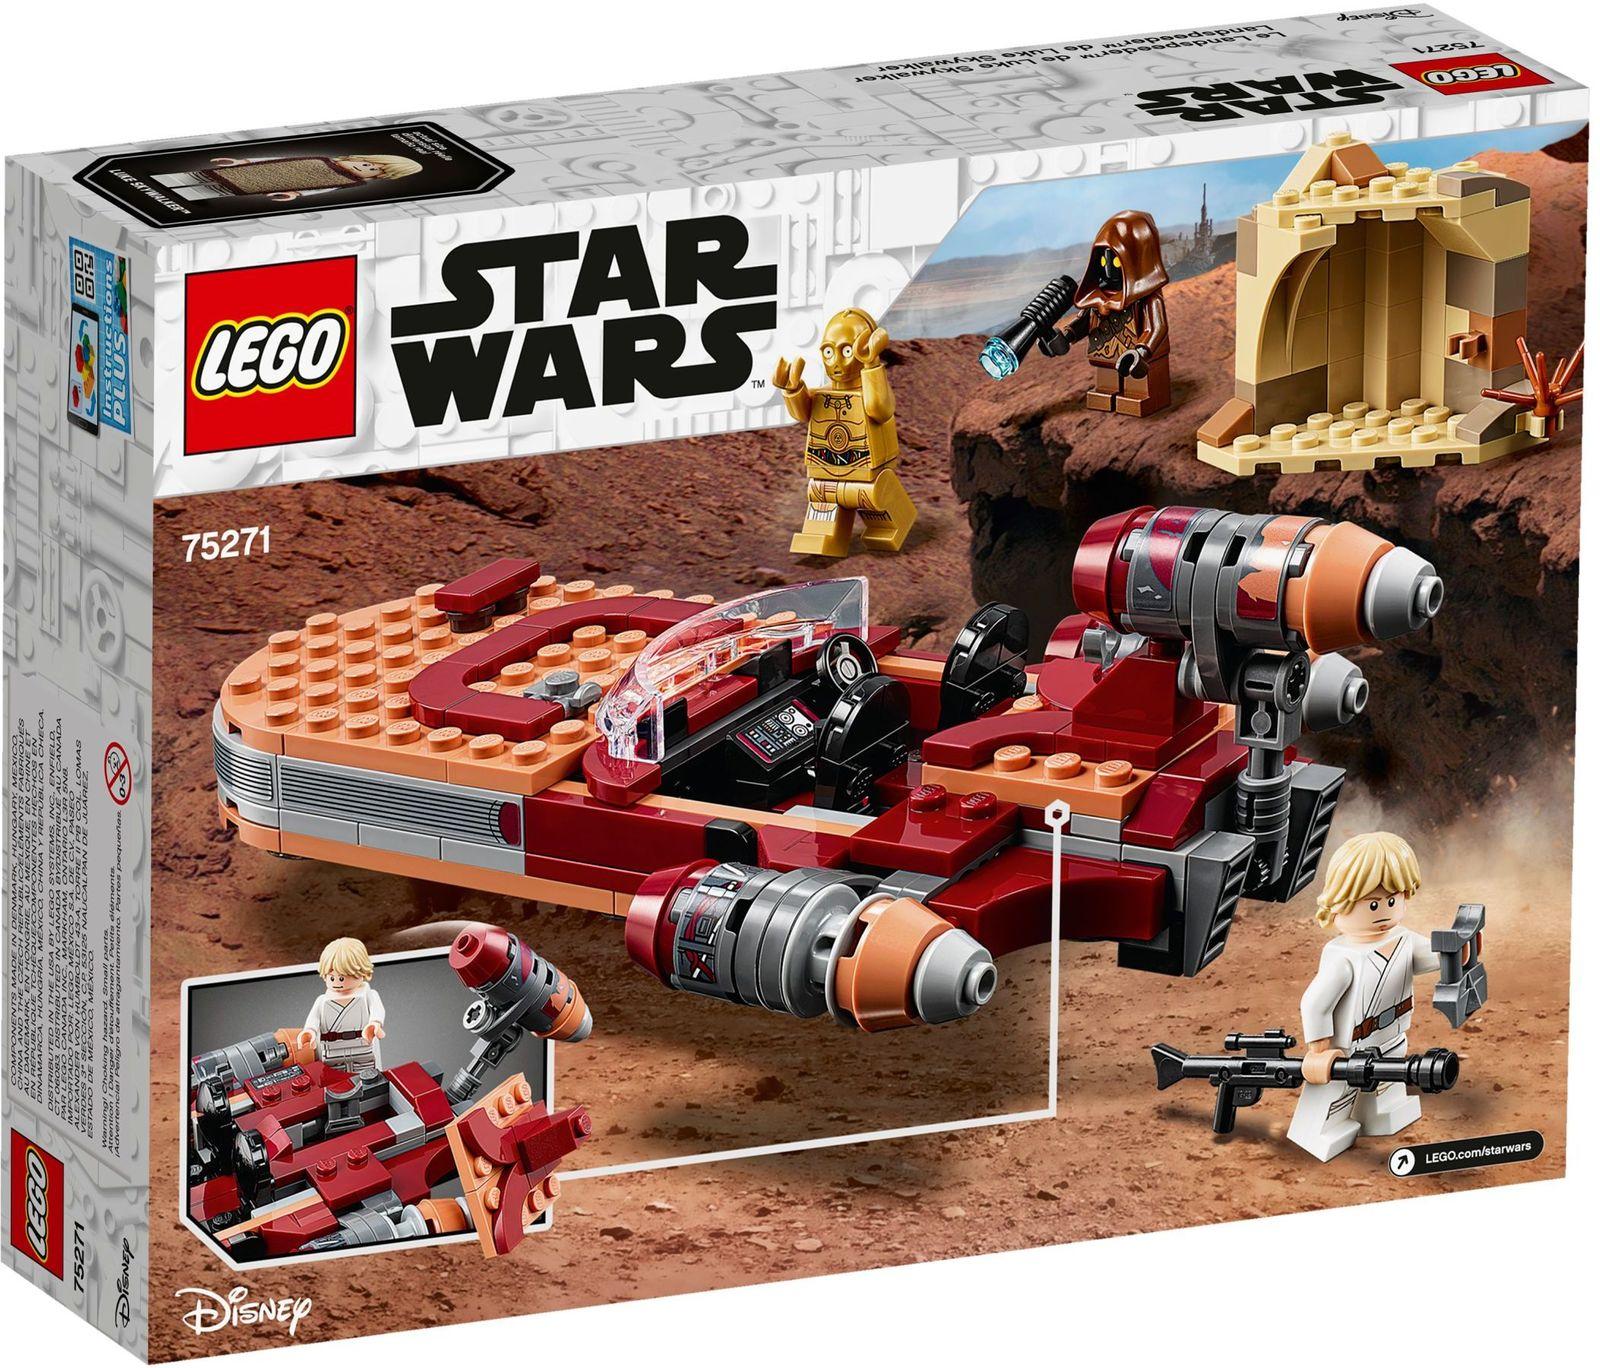 LEGO Star Wars - Luke Skywalker's Landspeeder image